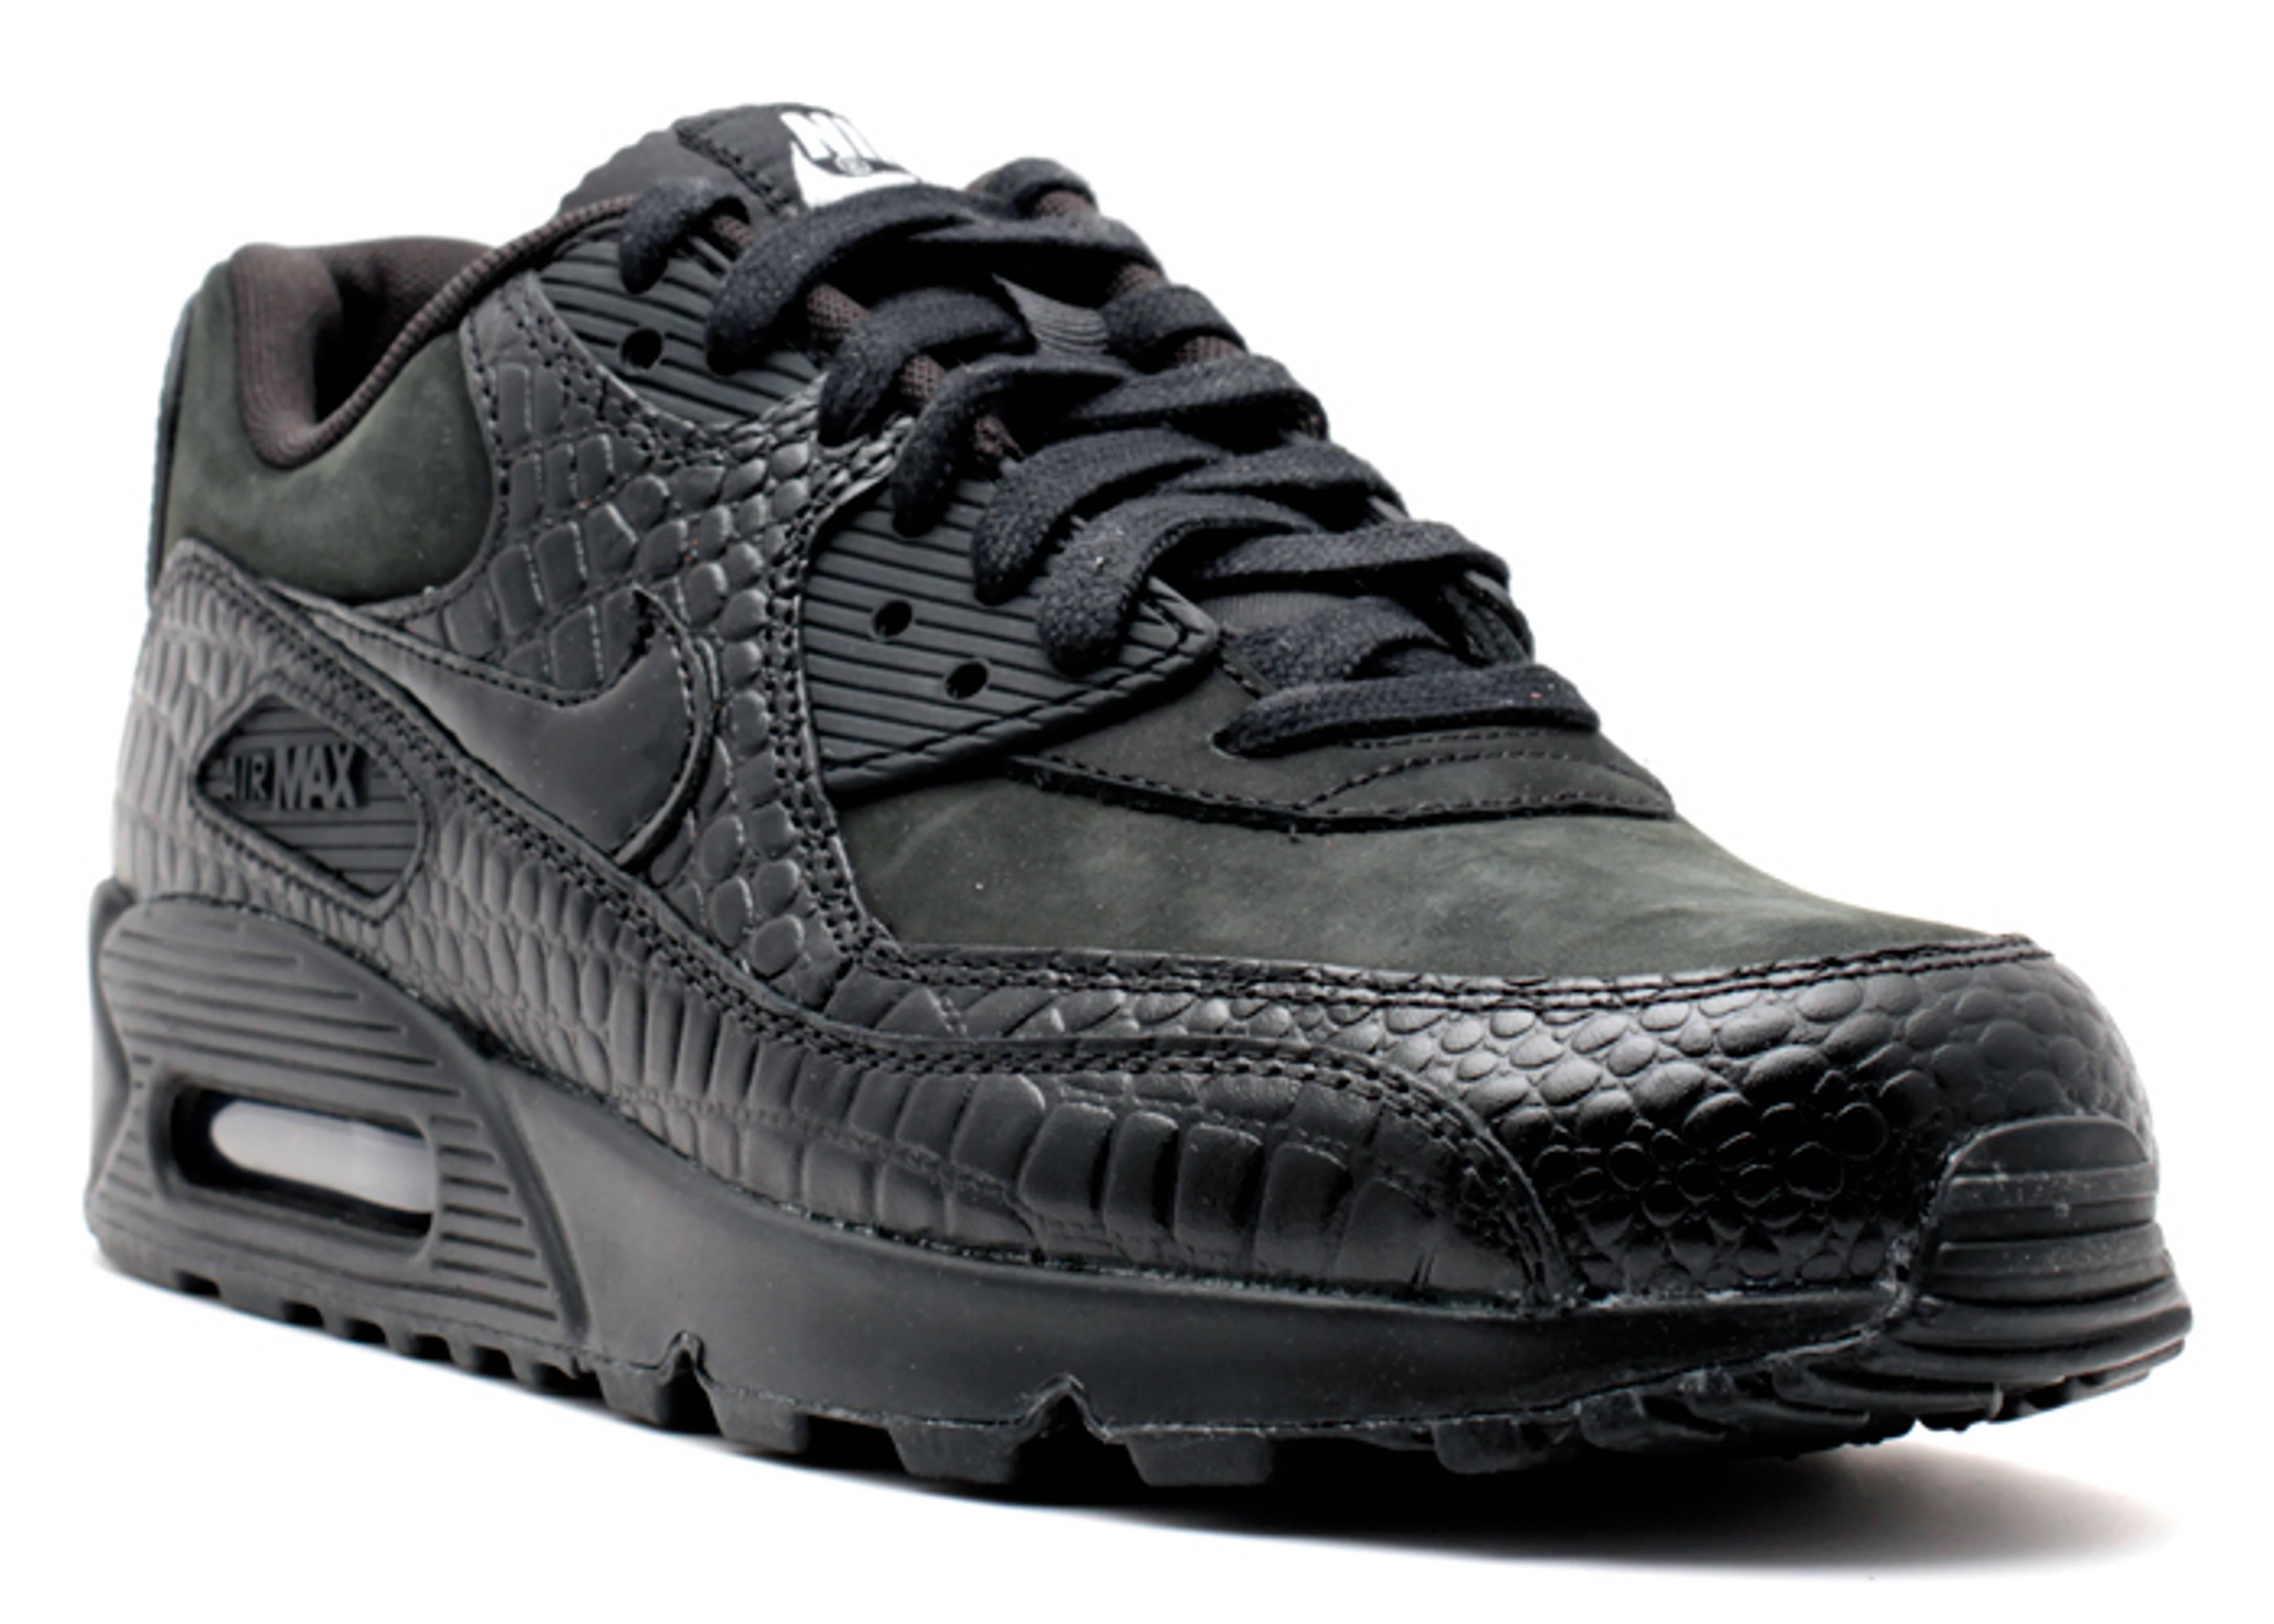 wholesale dealer cc2f6 93d98 nike womens air max 1 black reptile ws air max 90 prem black black mtllc  silver vlt